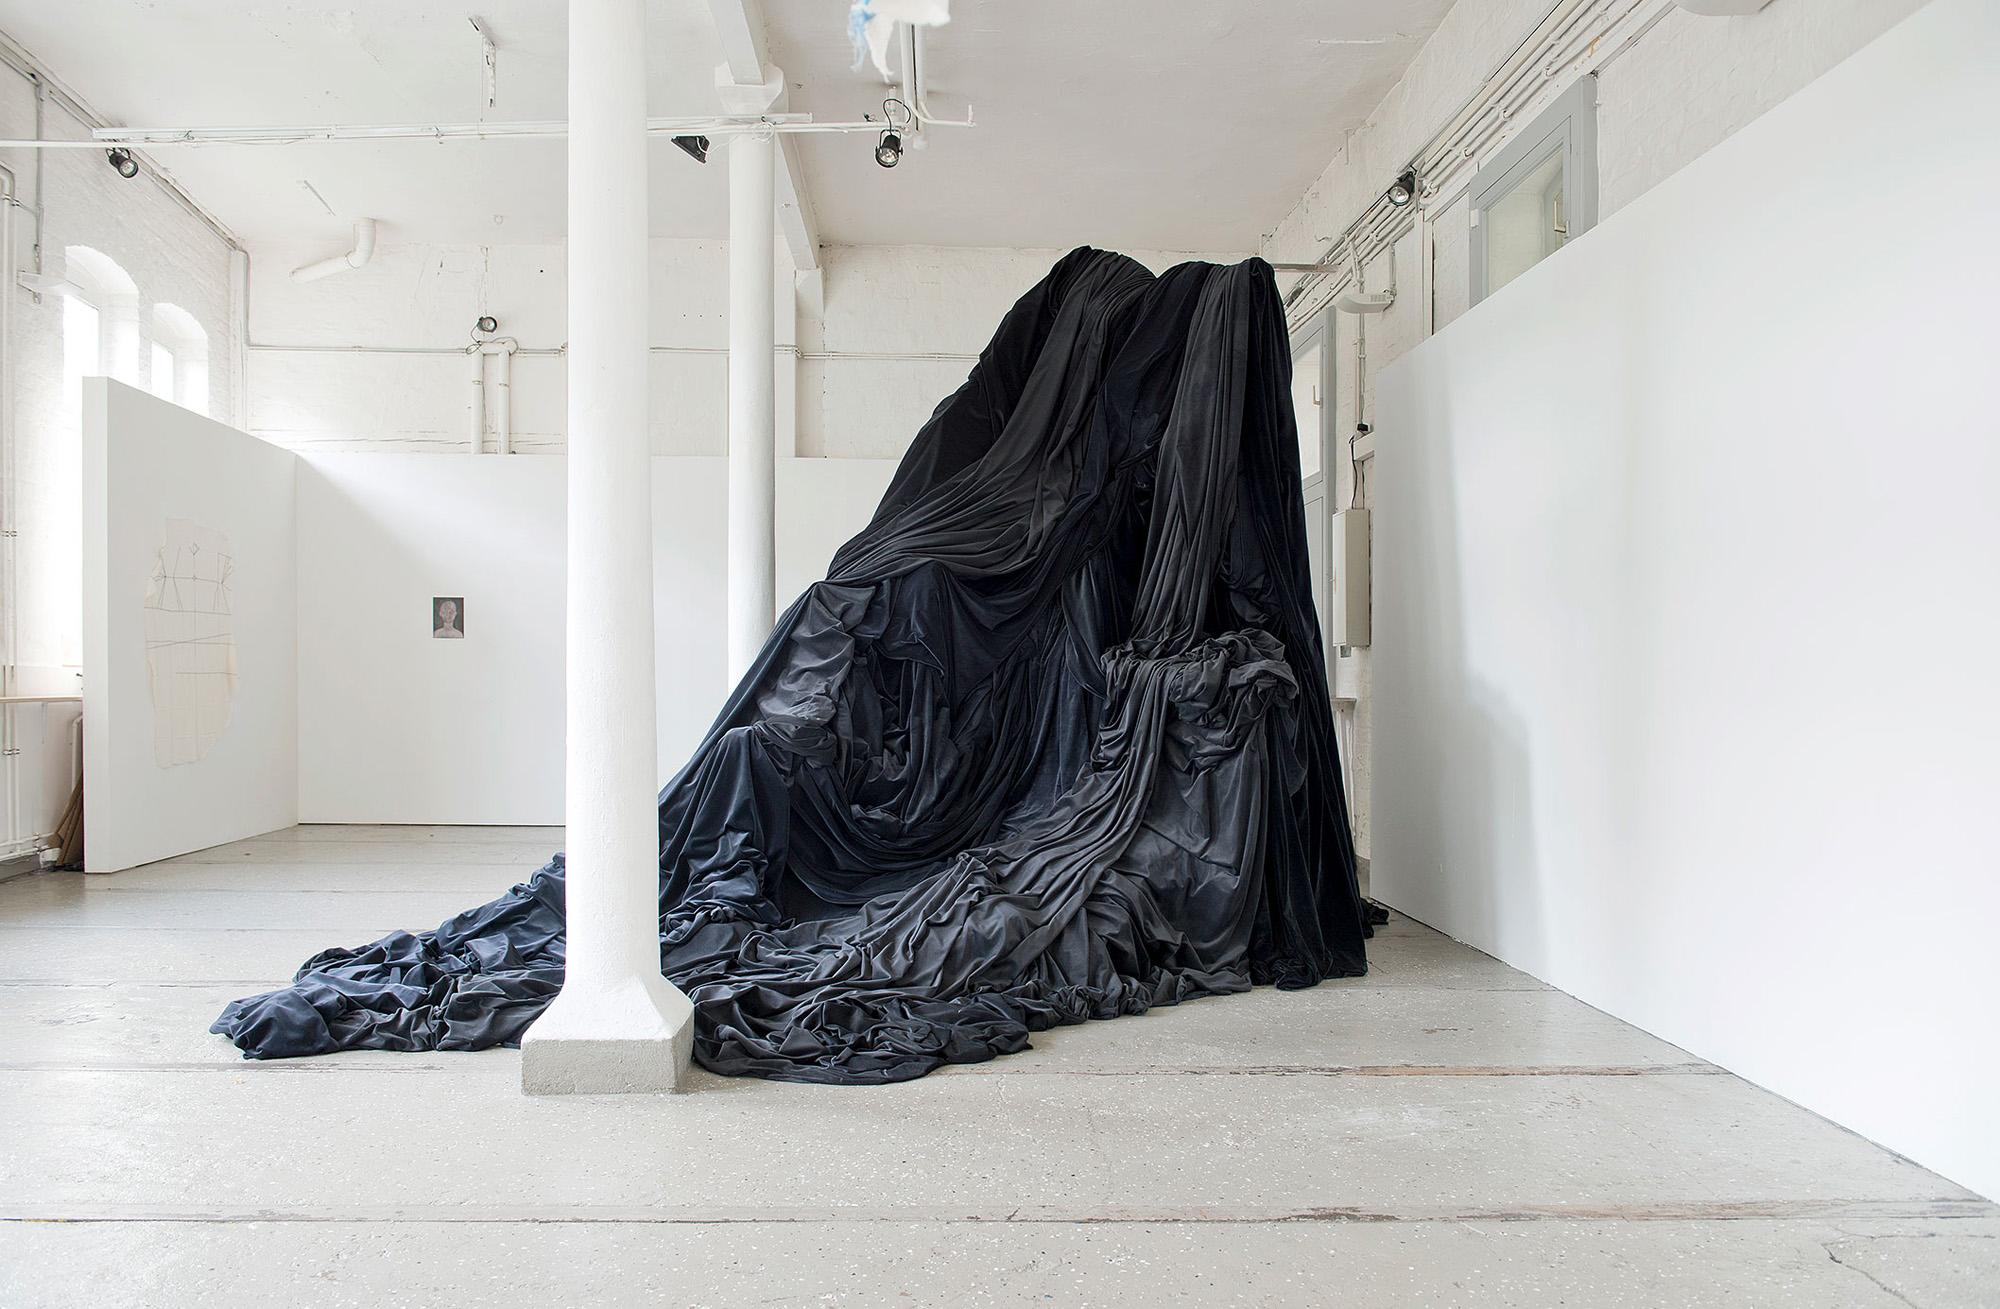 o.T. 2014; 340 x 480 cm